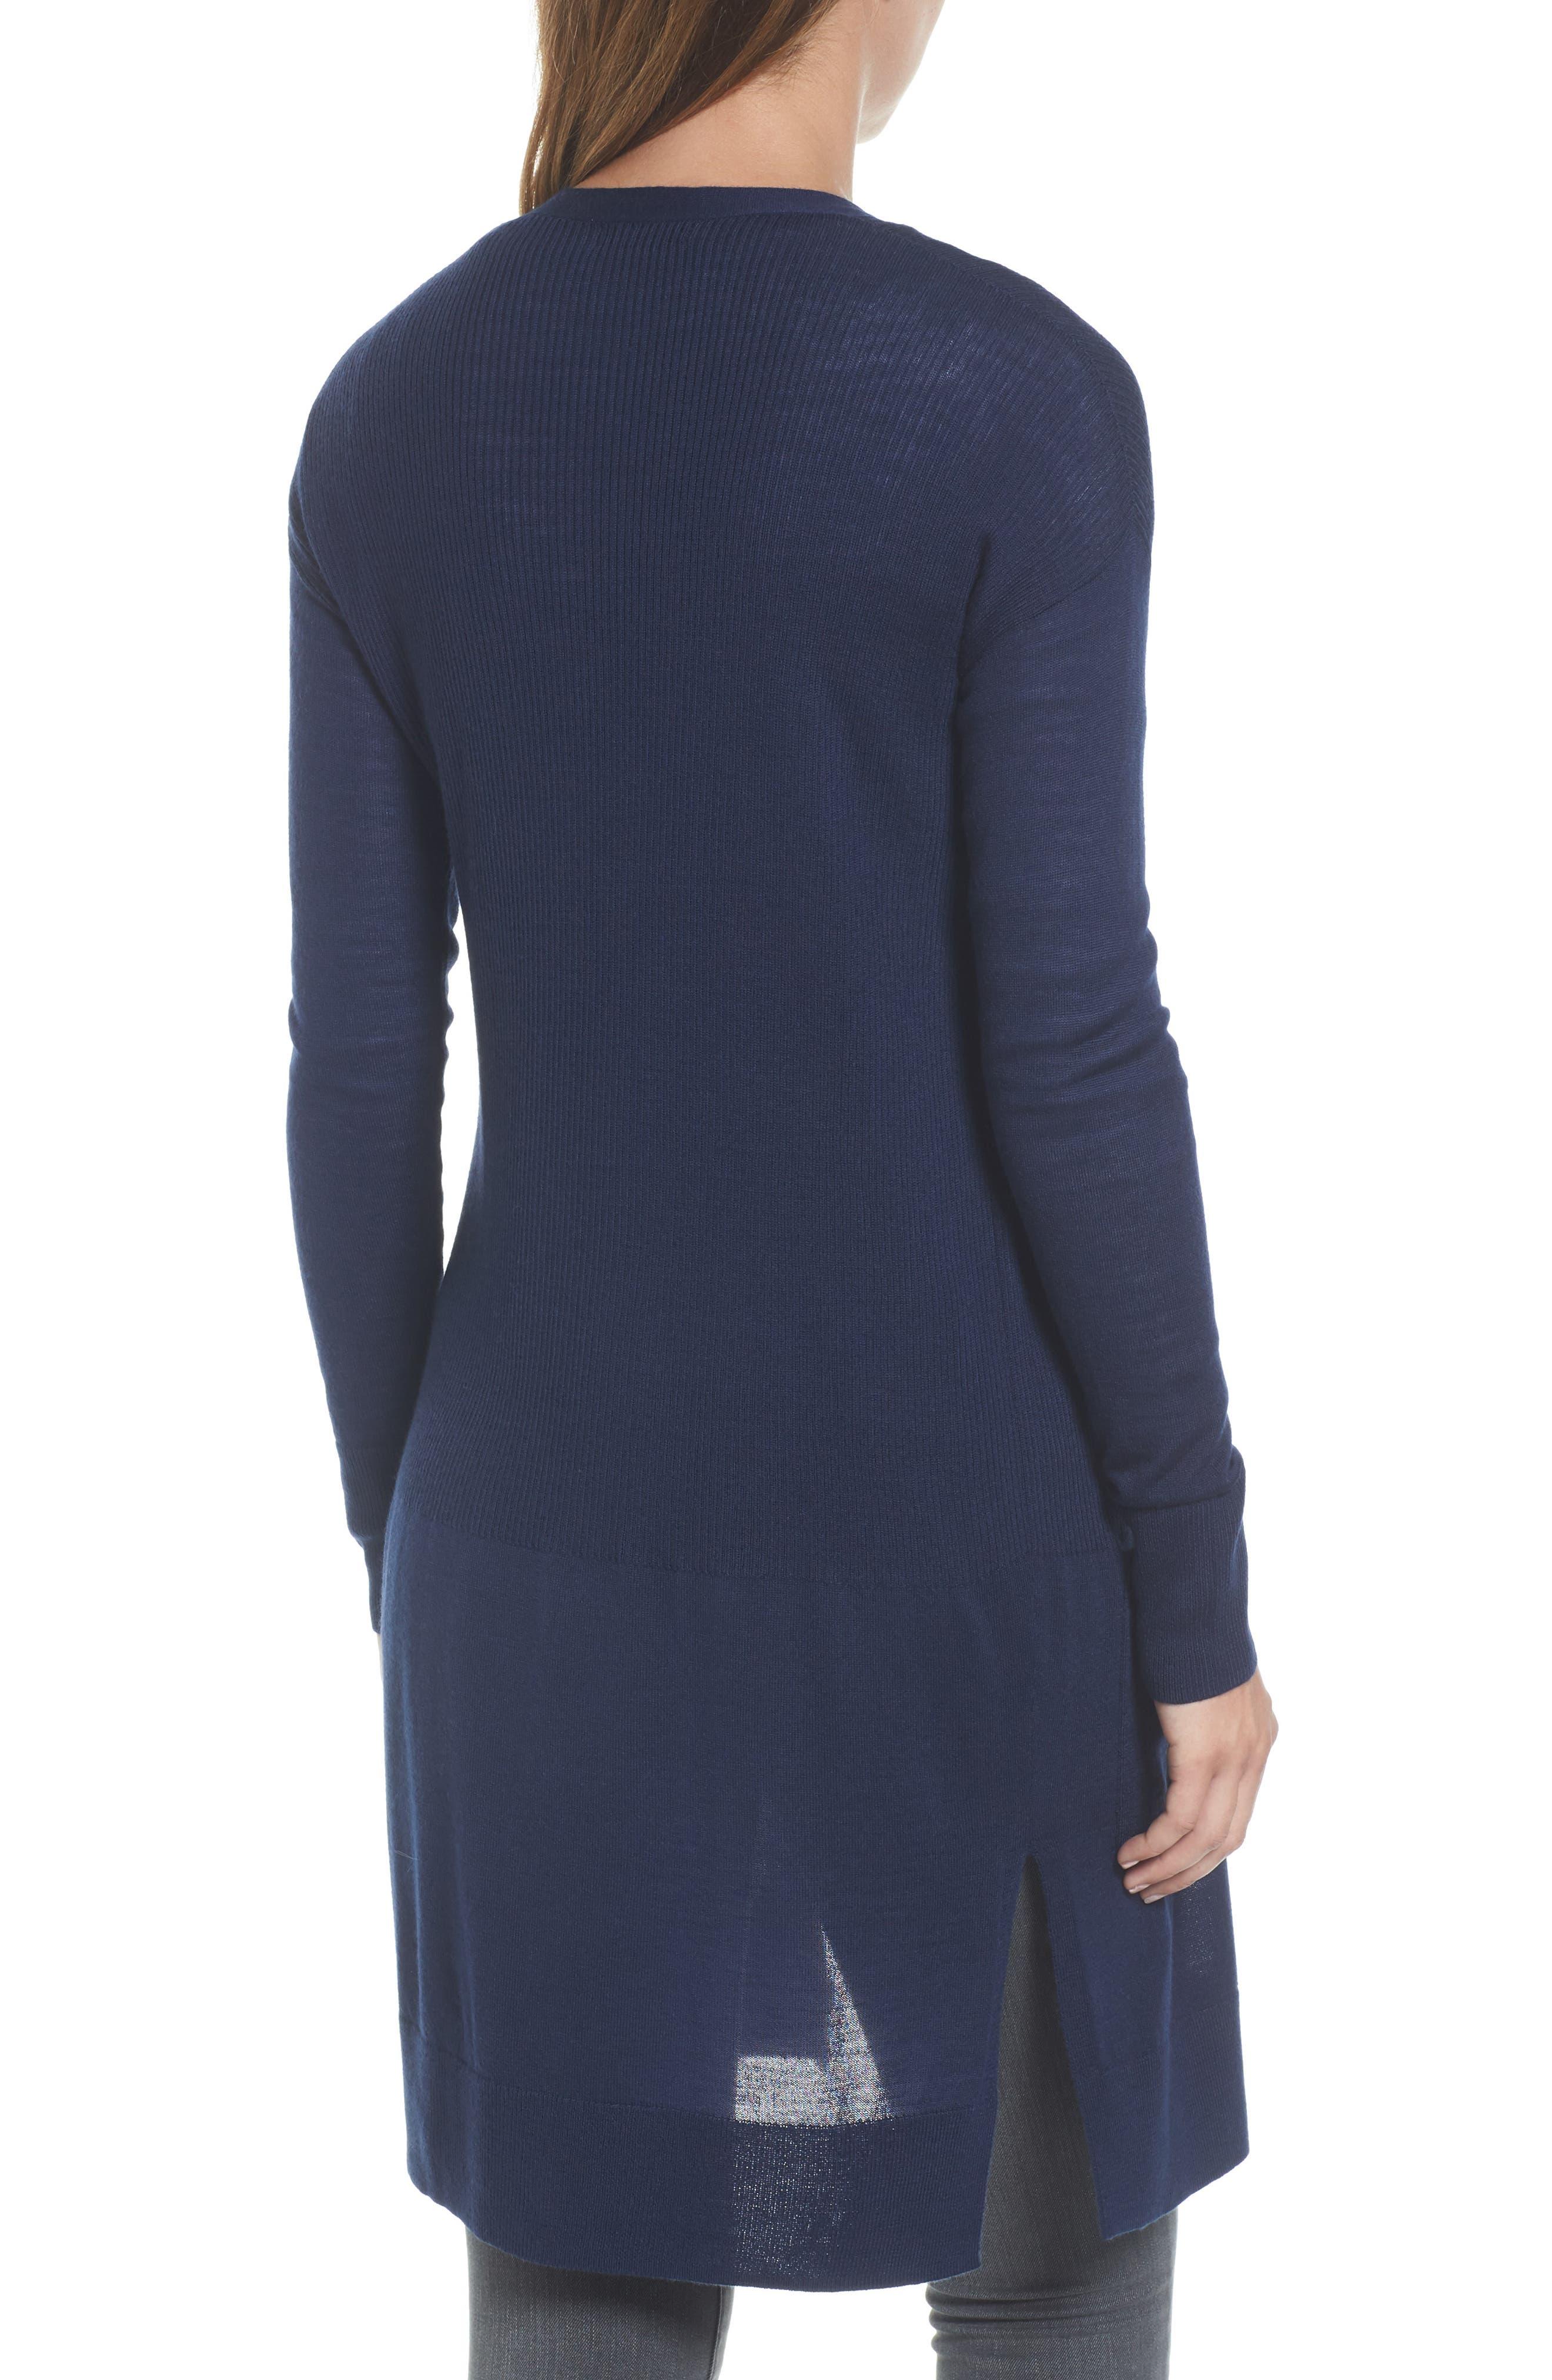 Alternate Image 2  - Halogen® Rib Knit Wool Blend Cardigan (Regular & Petite)